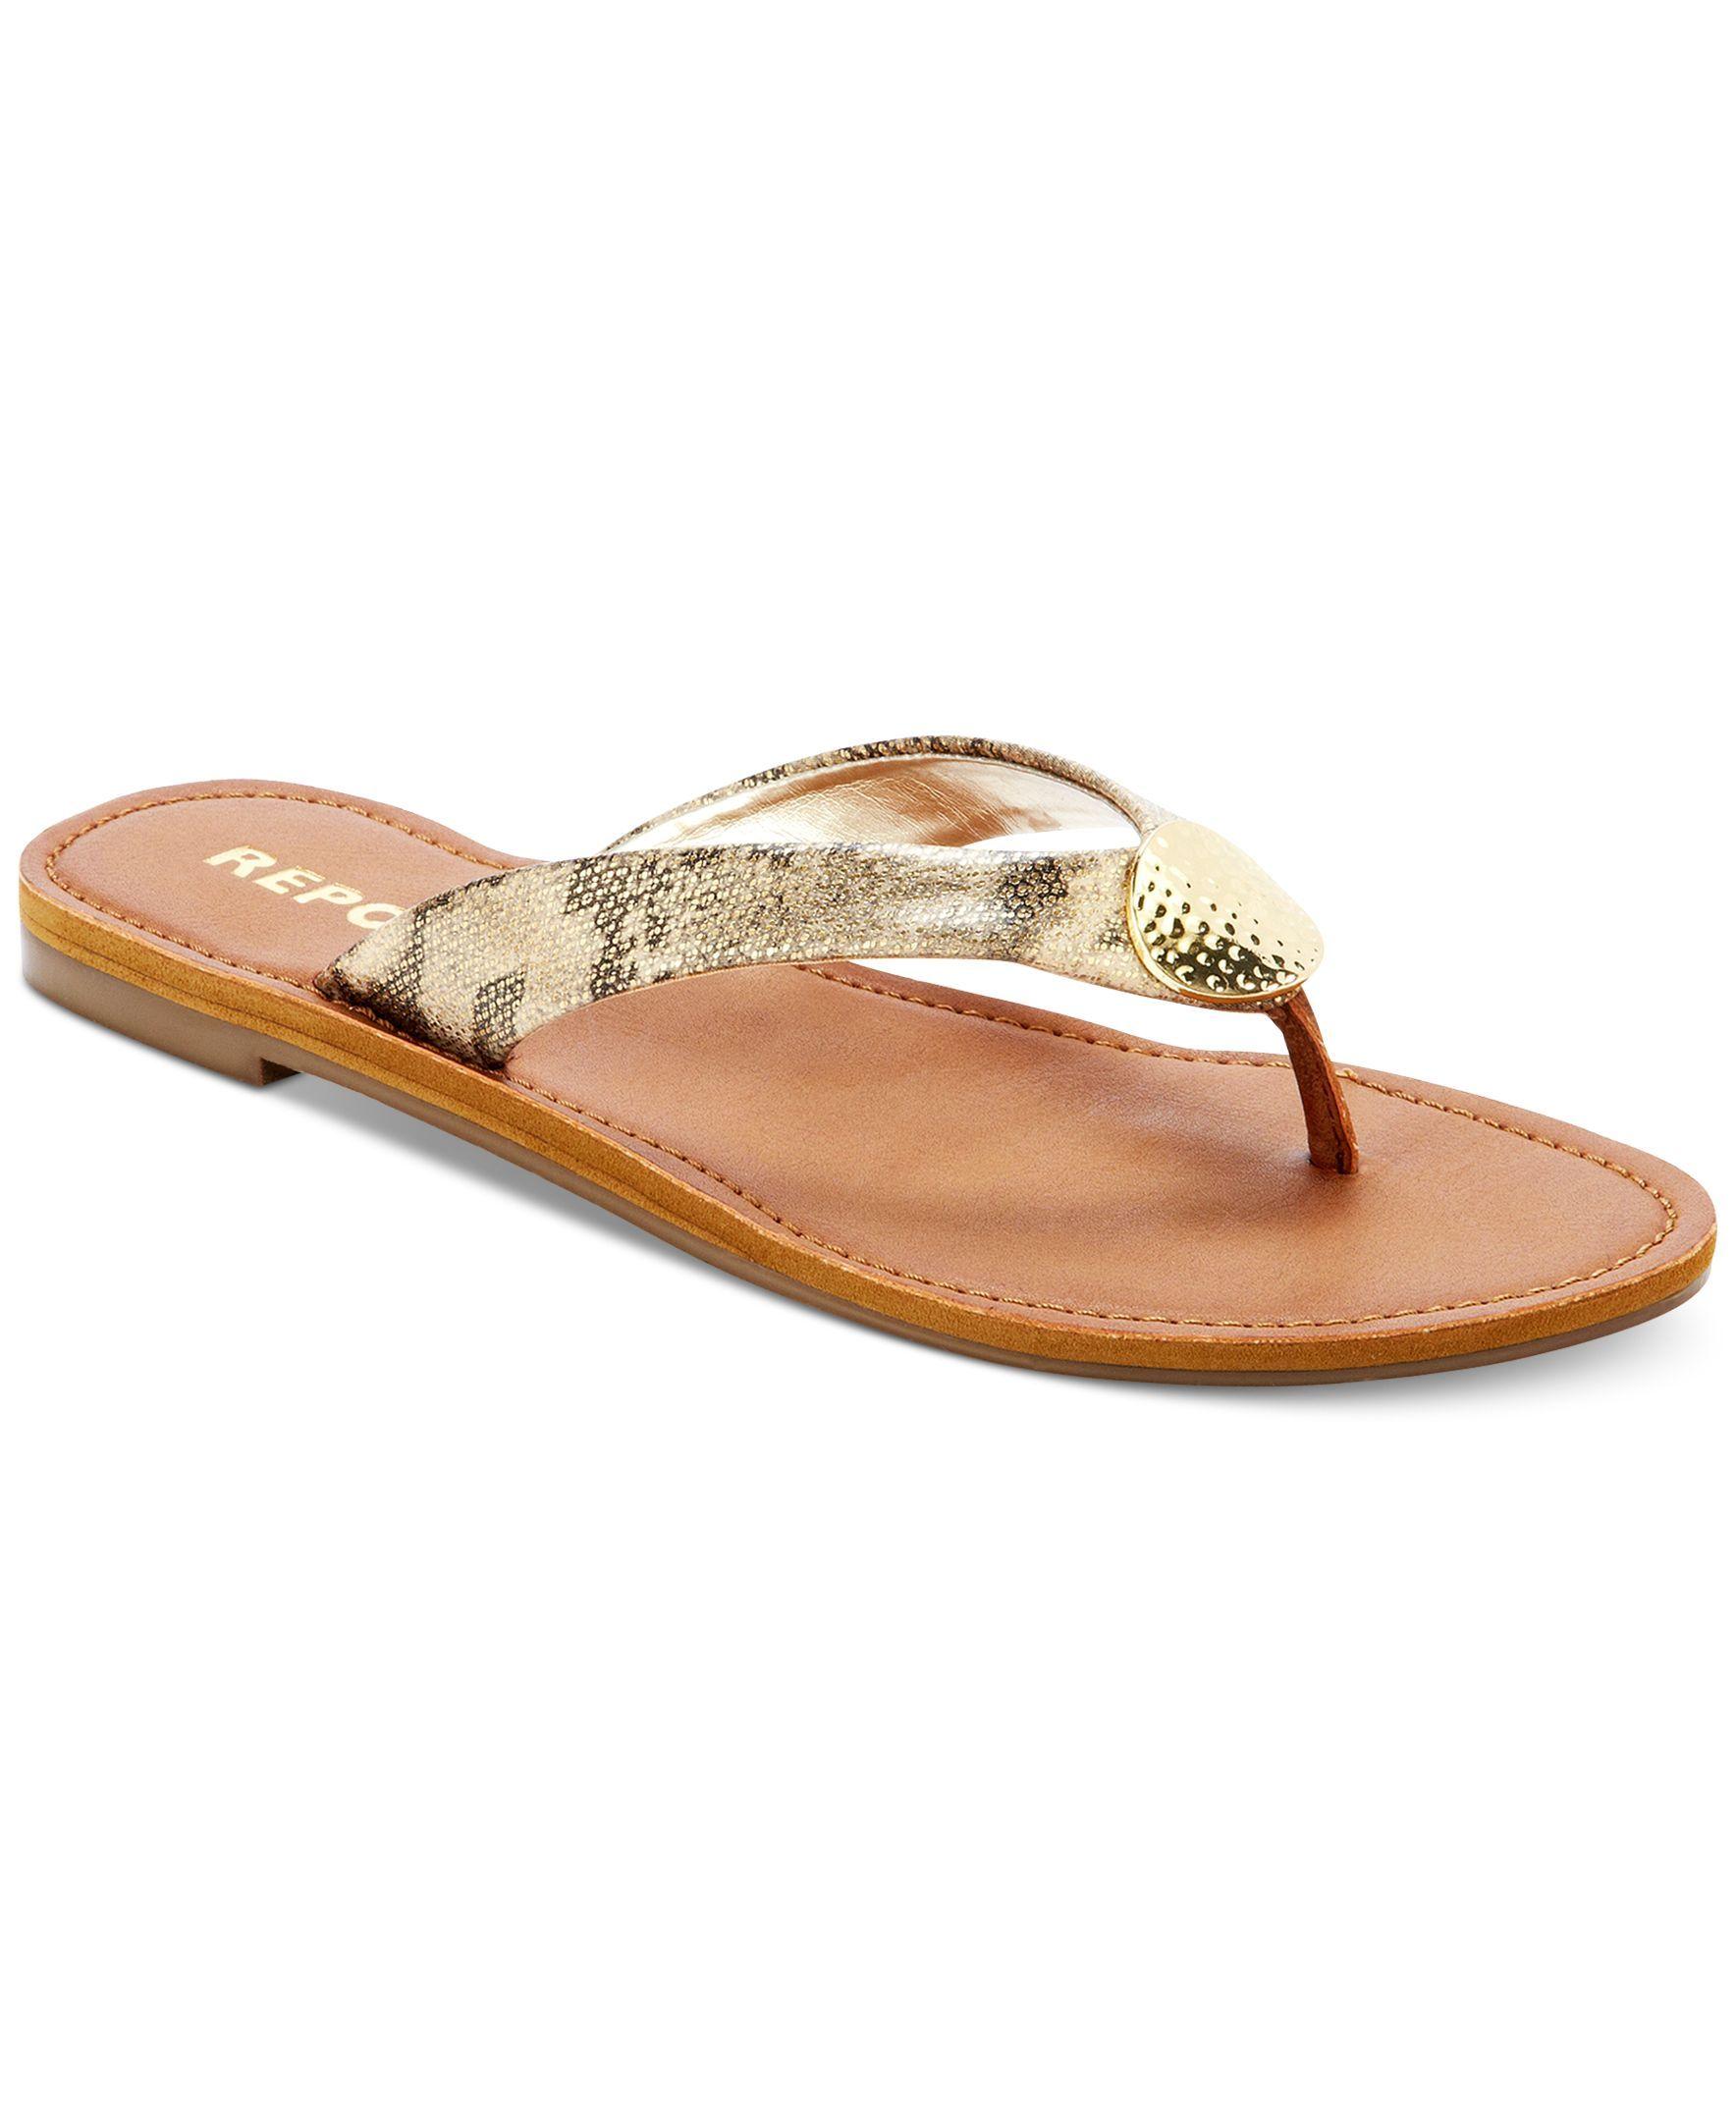 a5a07c56ccdb Report Shields Flat Thong Sandals